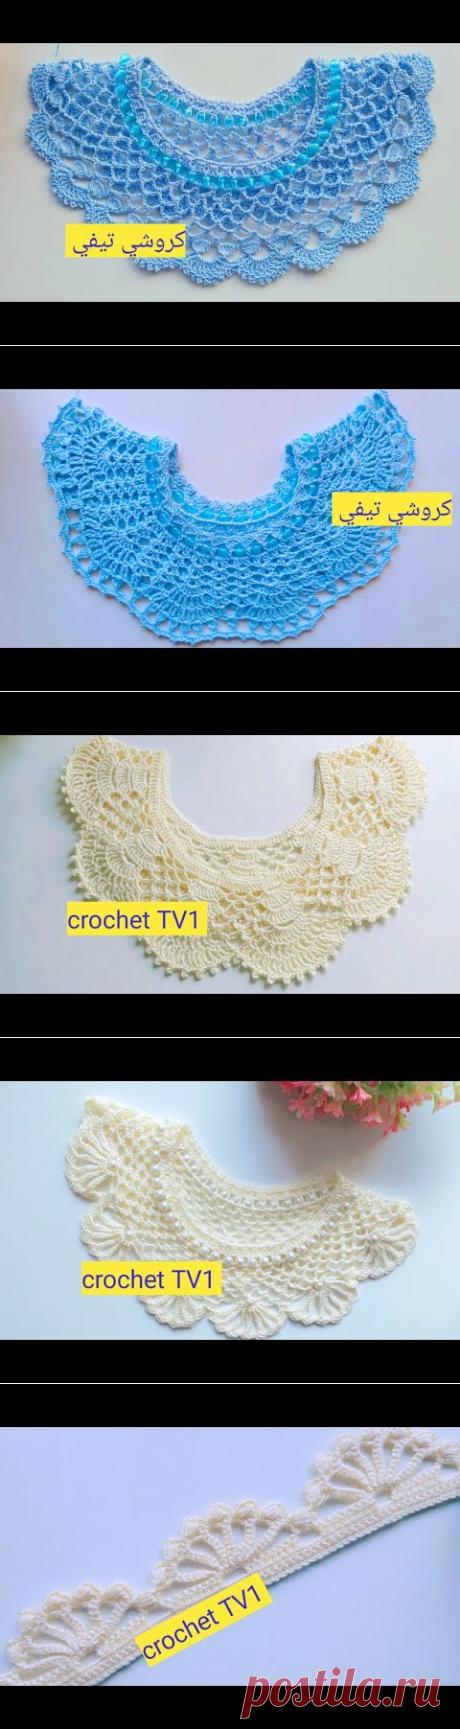 Crochet TV1 كروشي تيفي - YouTube